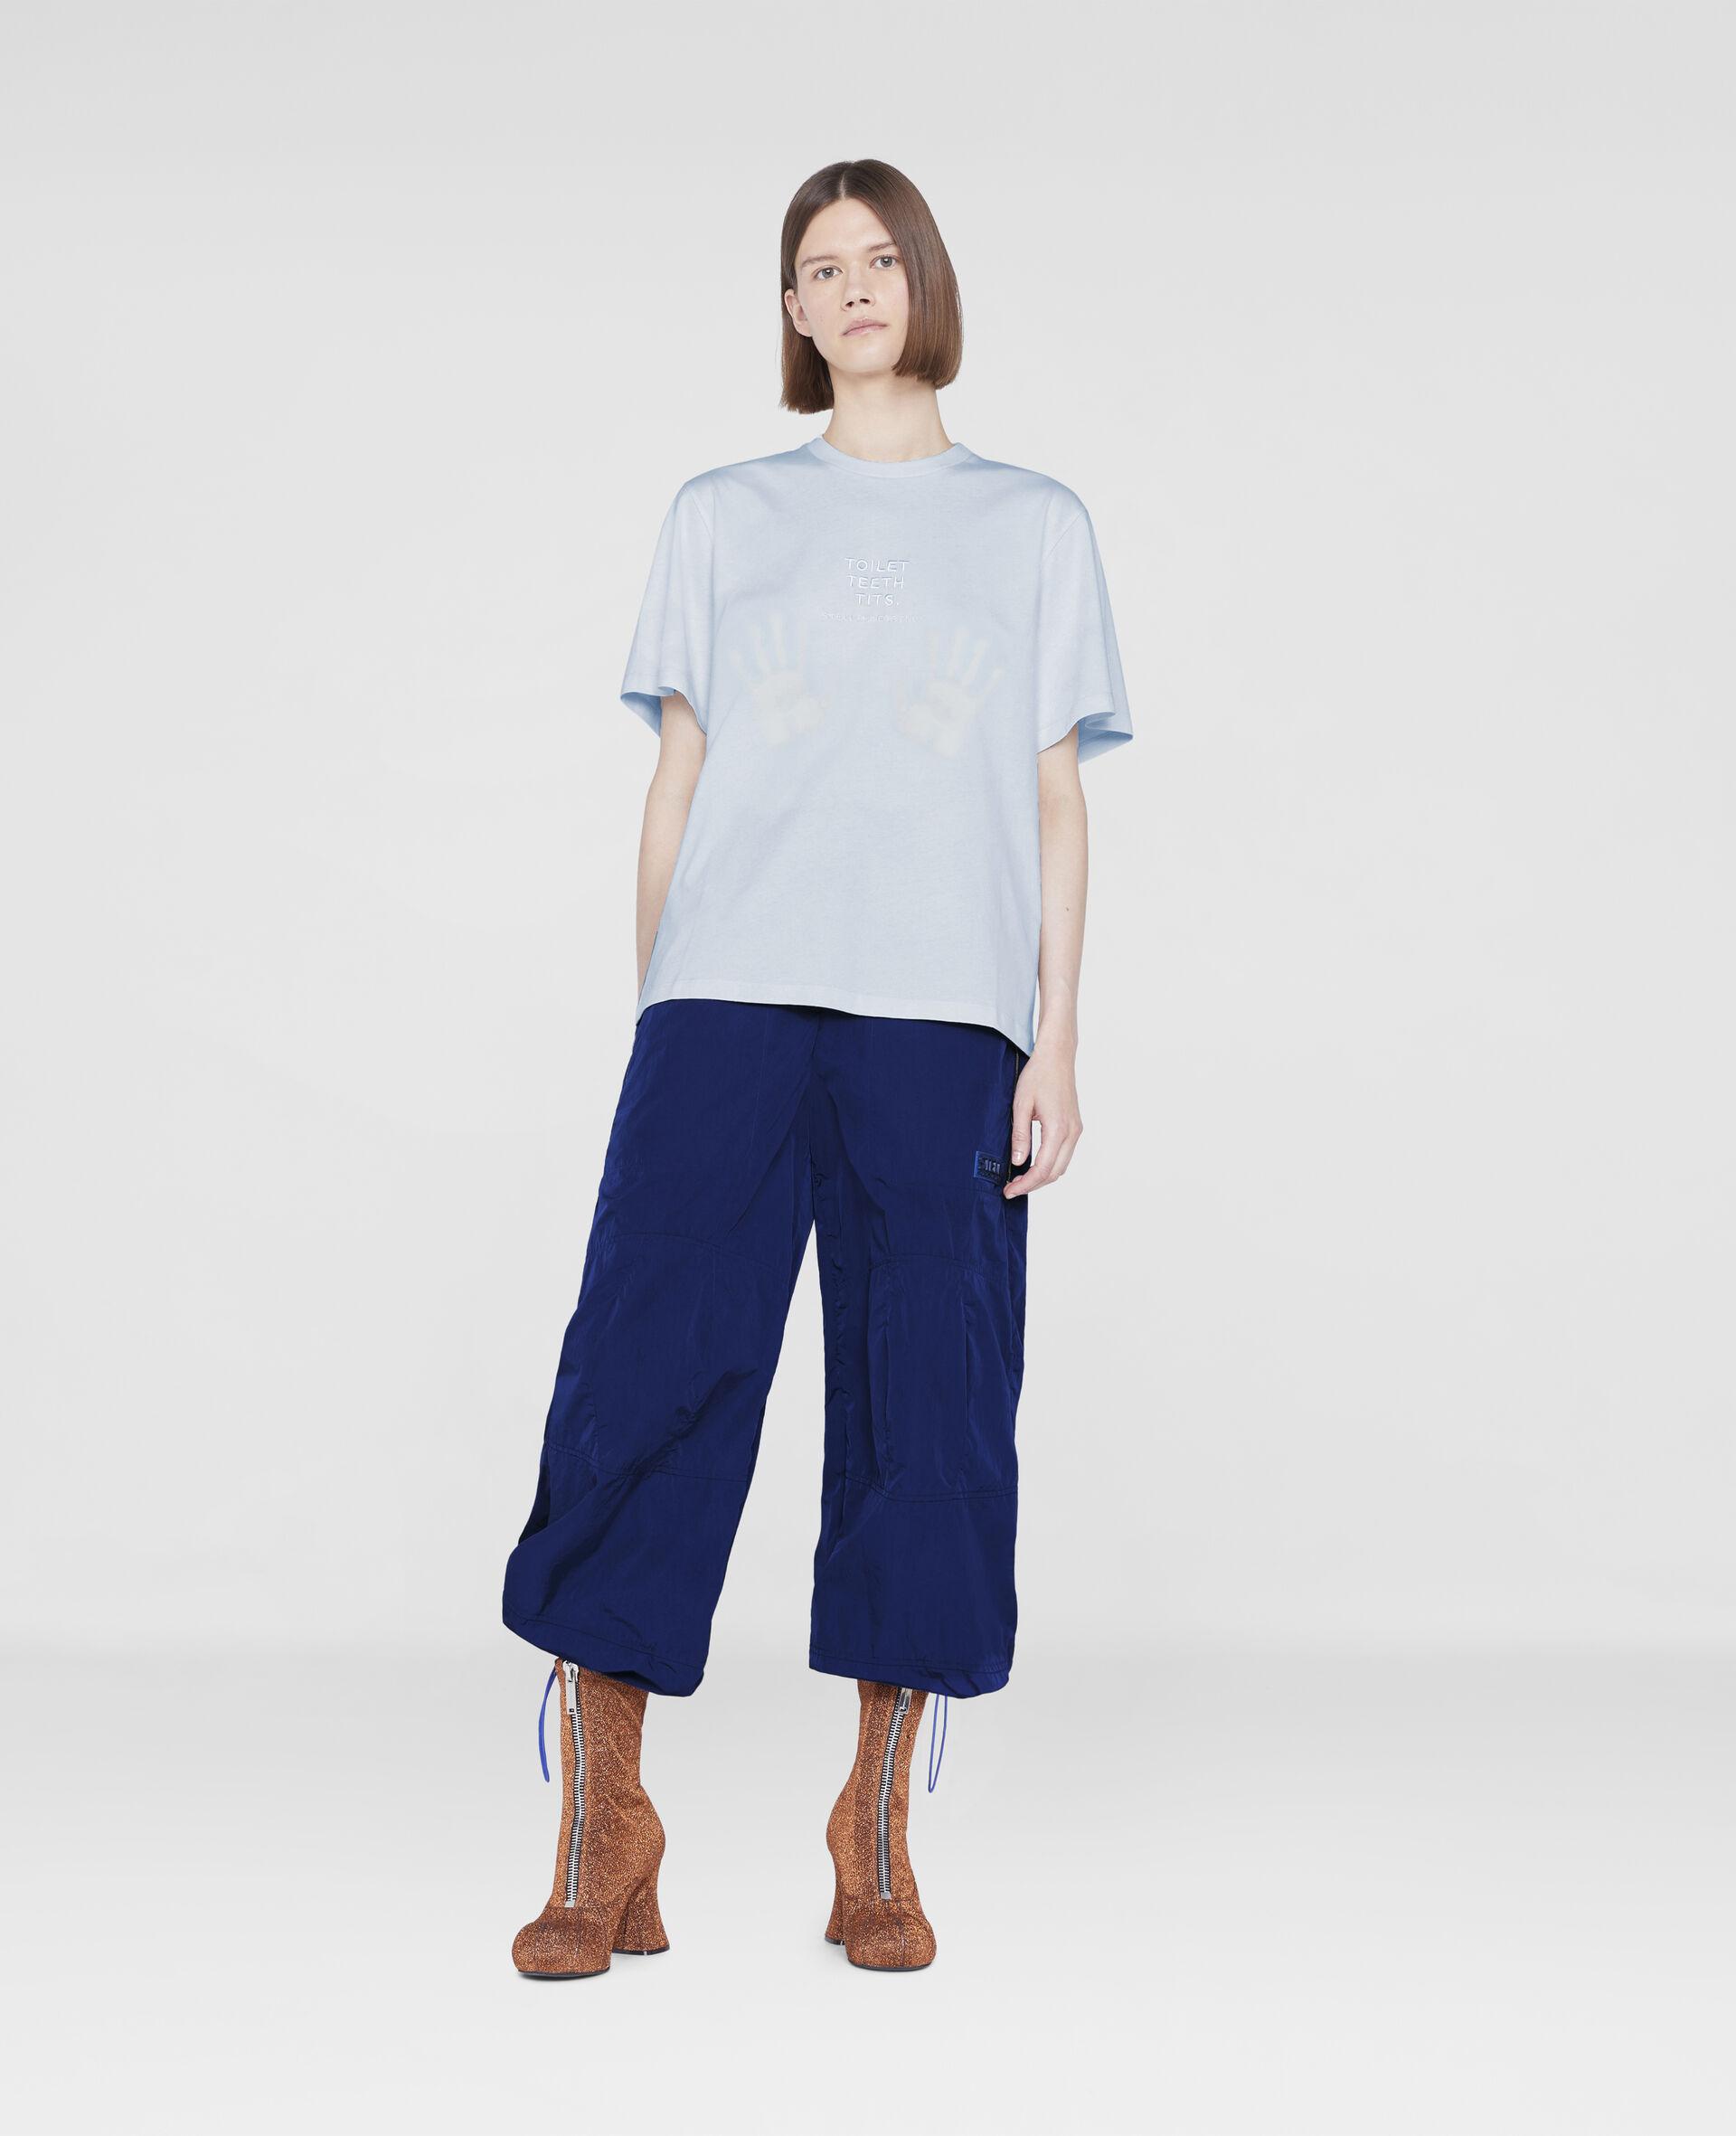 BCA 2021: Toilet, Tits, Teeth (TTT) T-shirt-Blue-large image number 1